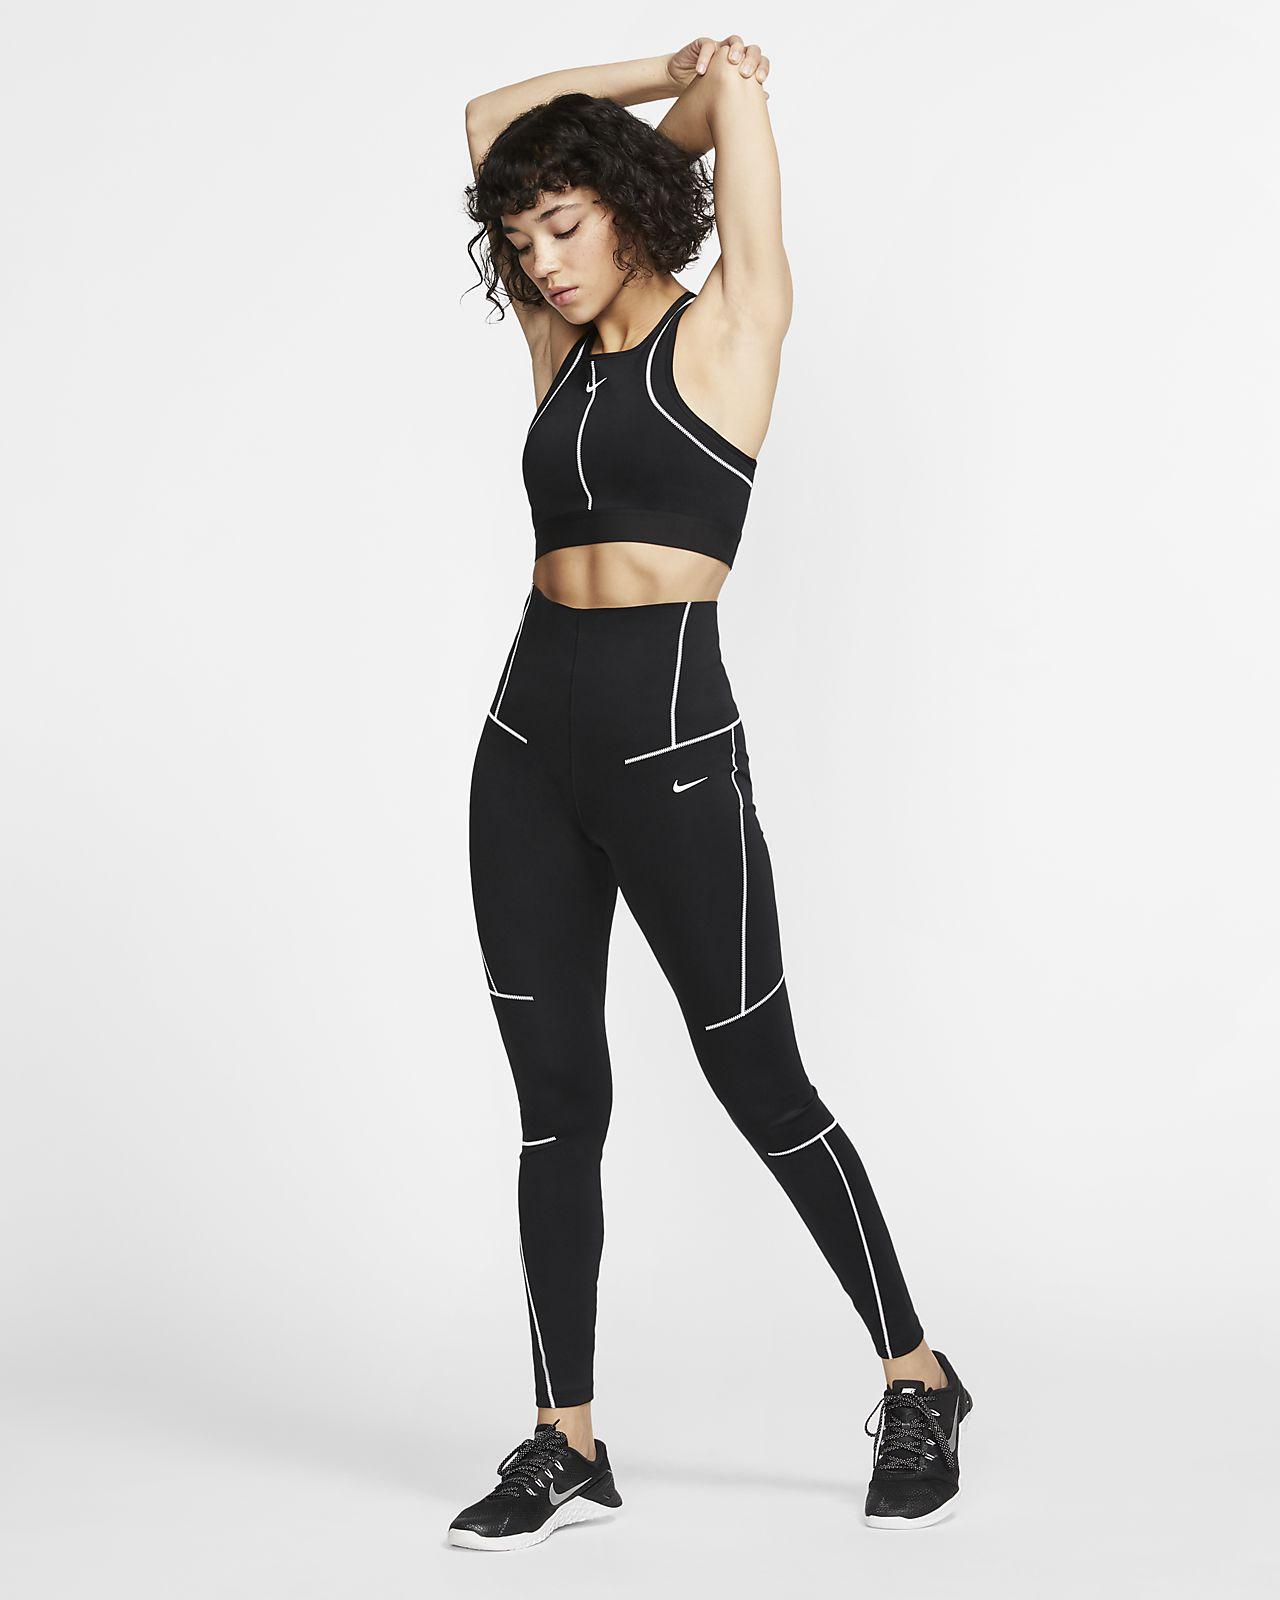 6beaeb720 Sujetador deportivo de sujeción media para mujer Nike Swoosh. Nike ...